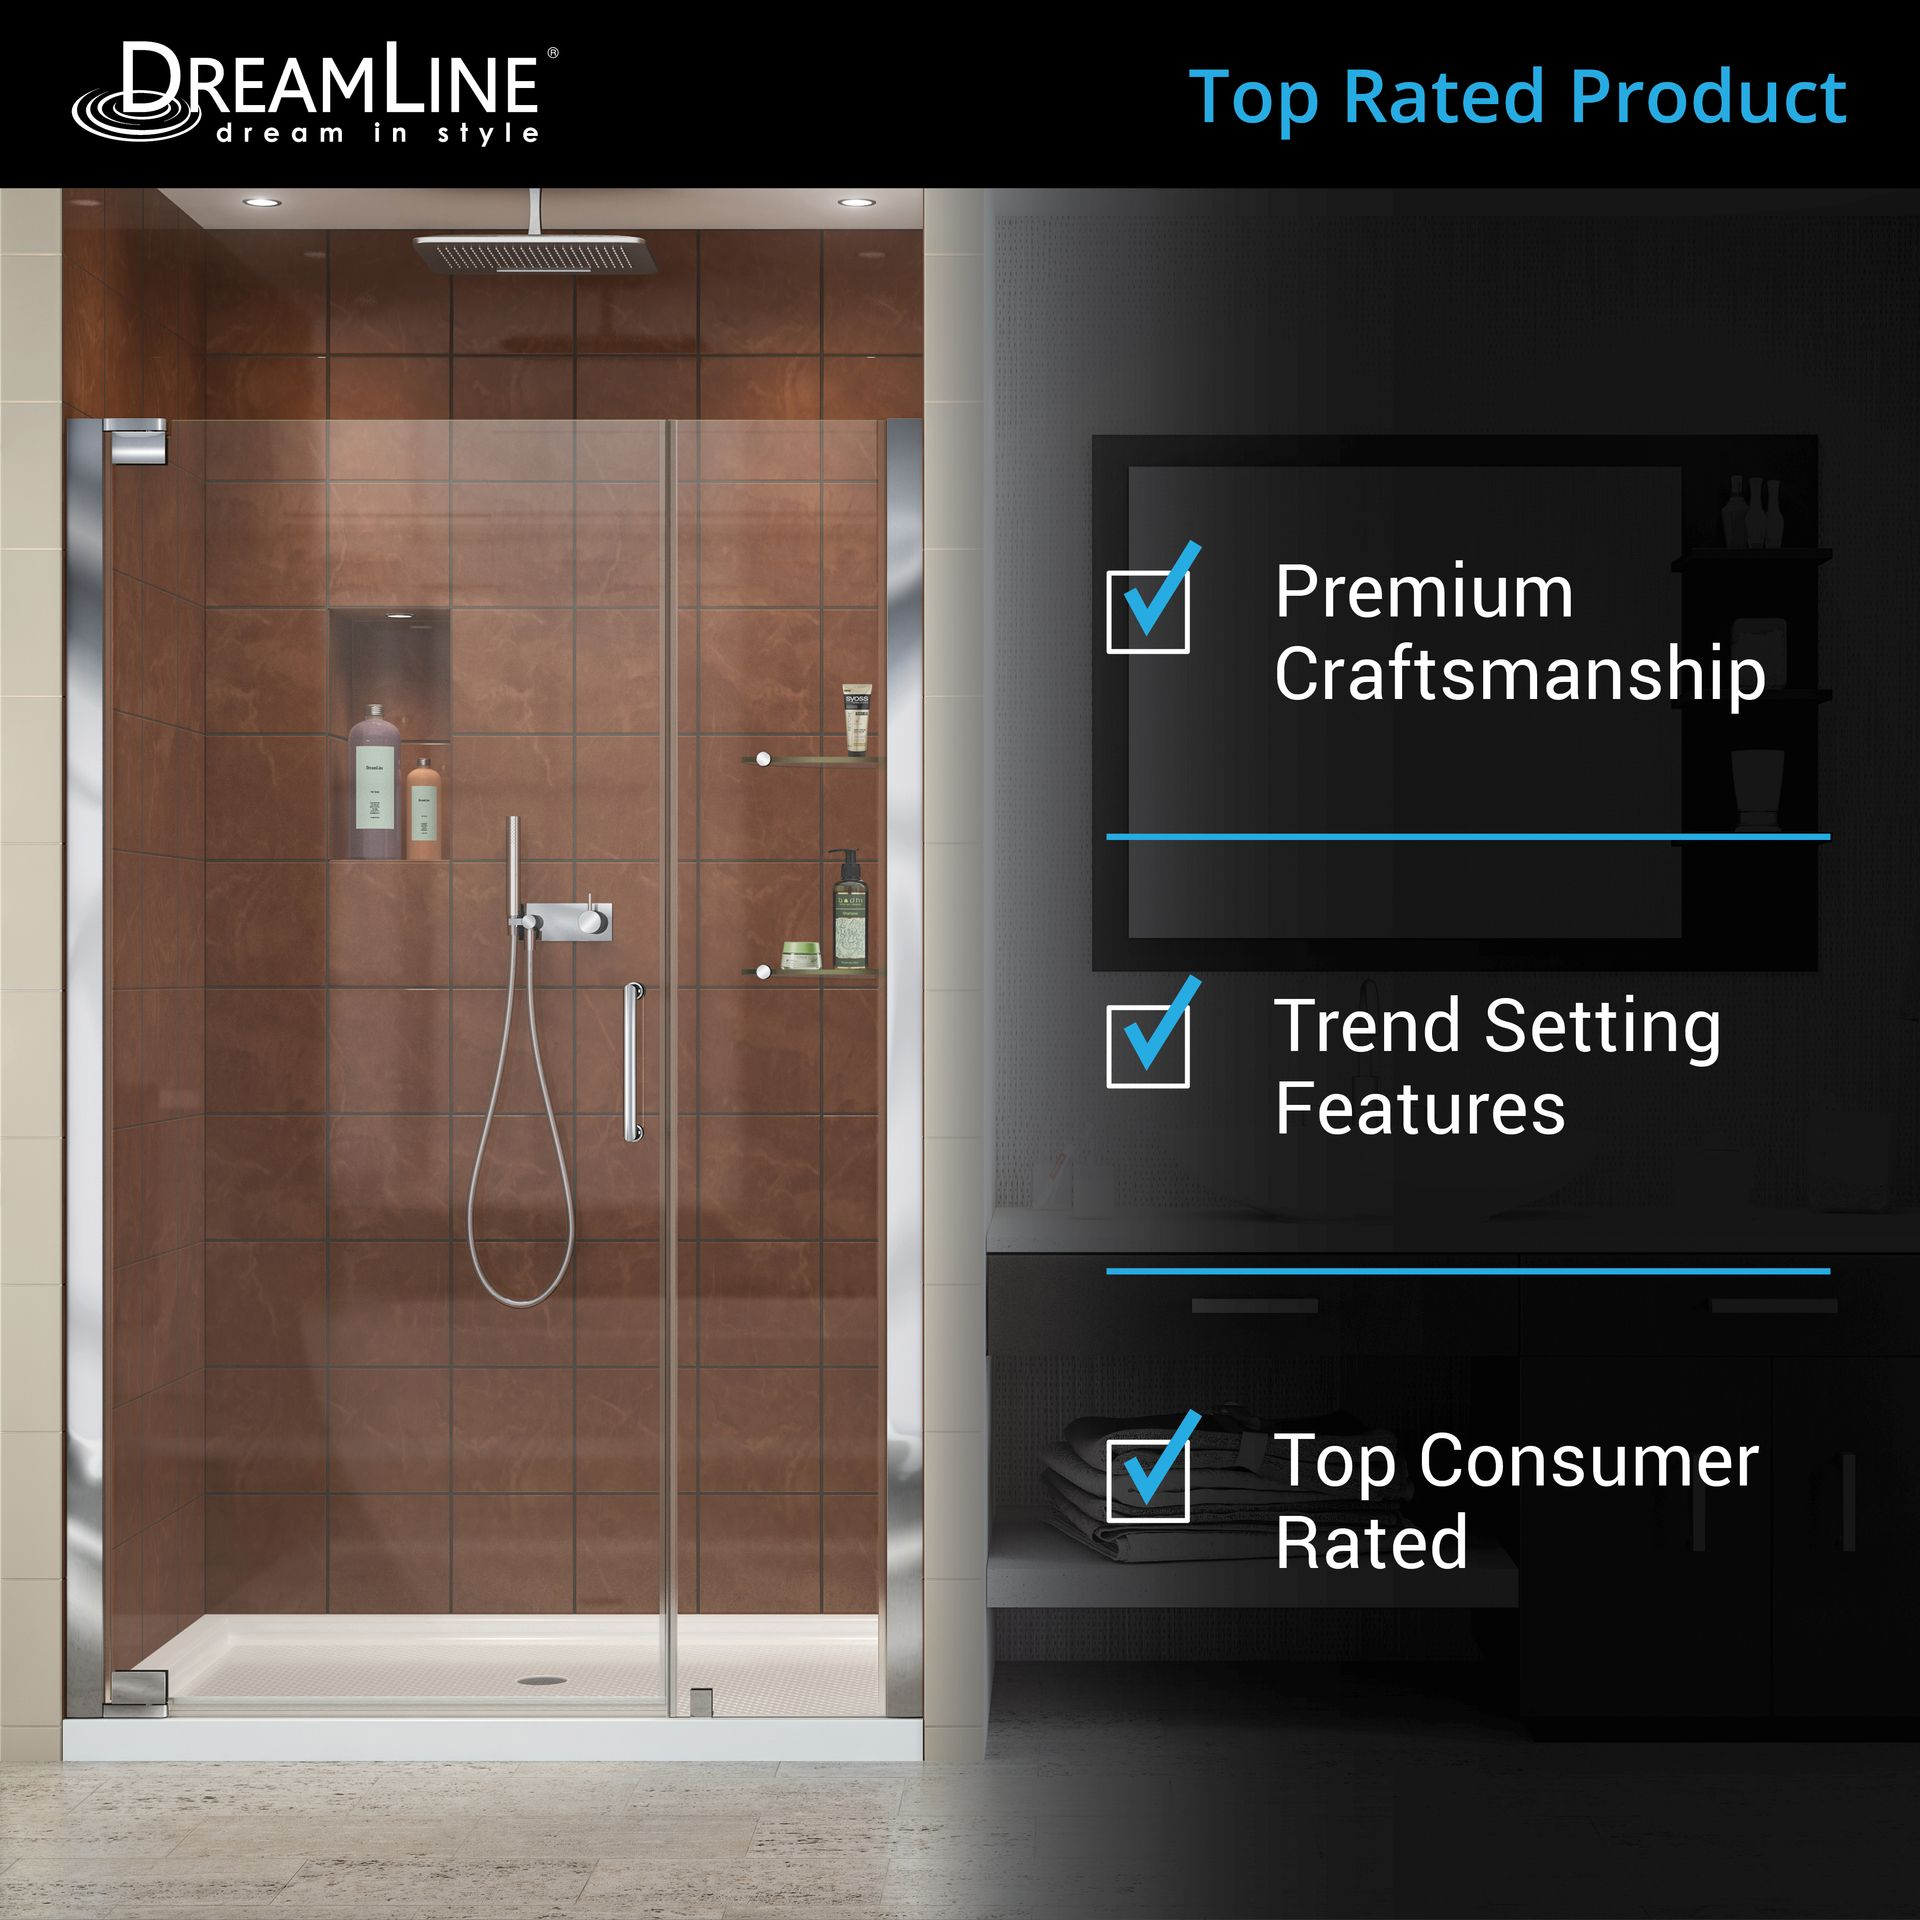 Dreamline Elegance 46 In To 48 In W Frameless Pivot Brushed Nickel